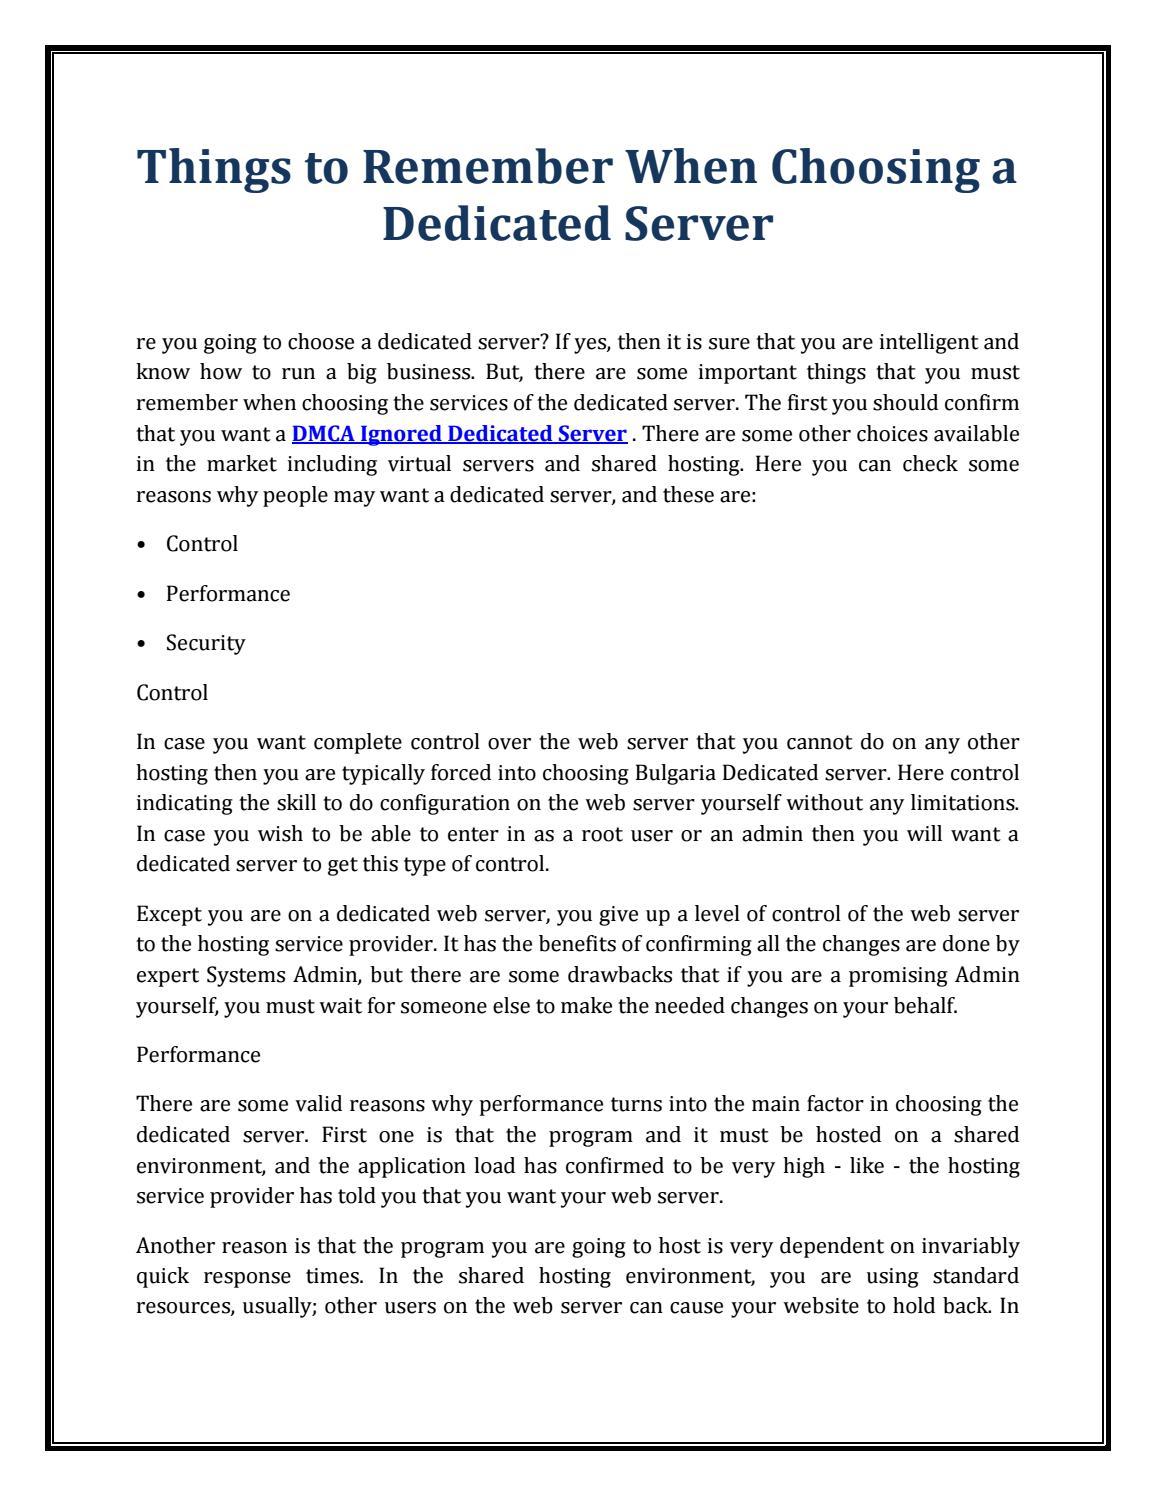 Dmca ignored dedicated server by johnnyrbalke - issuu